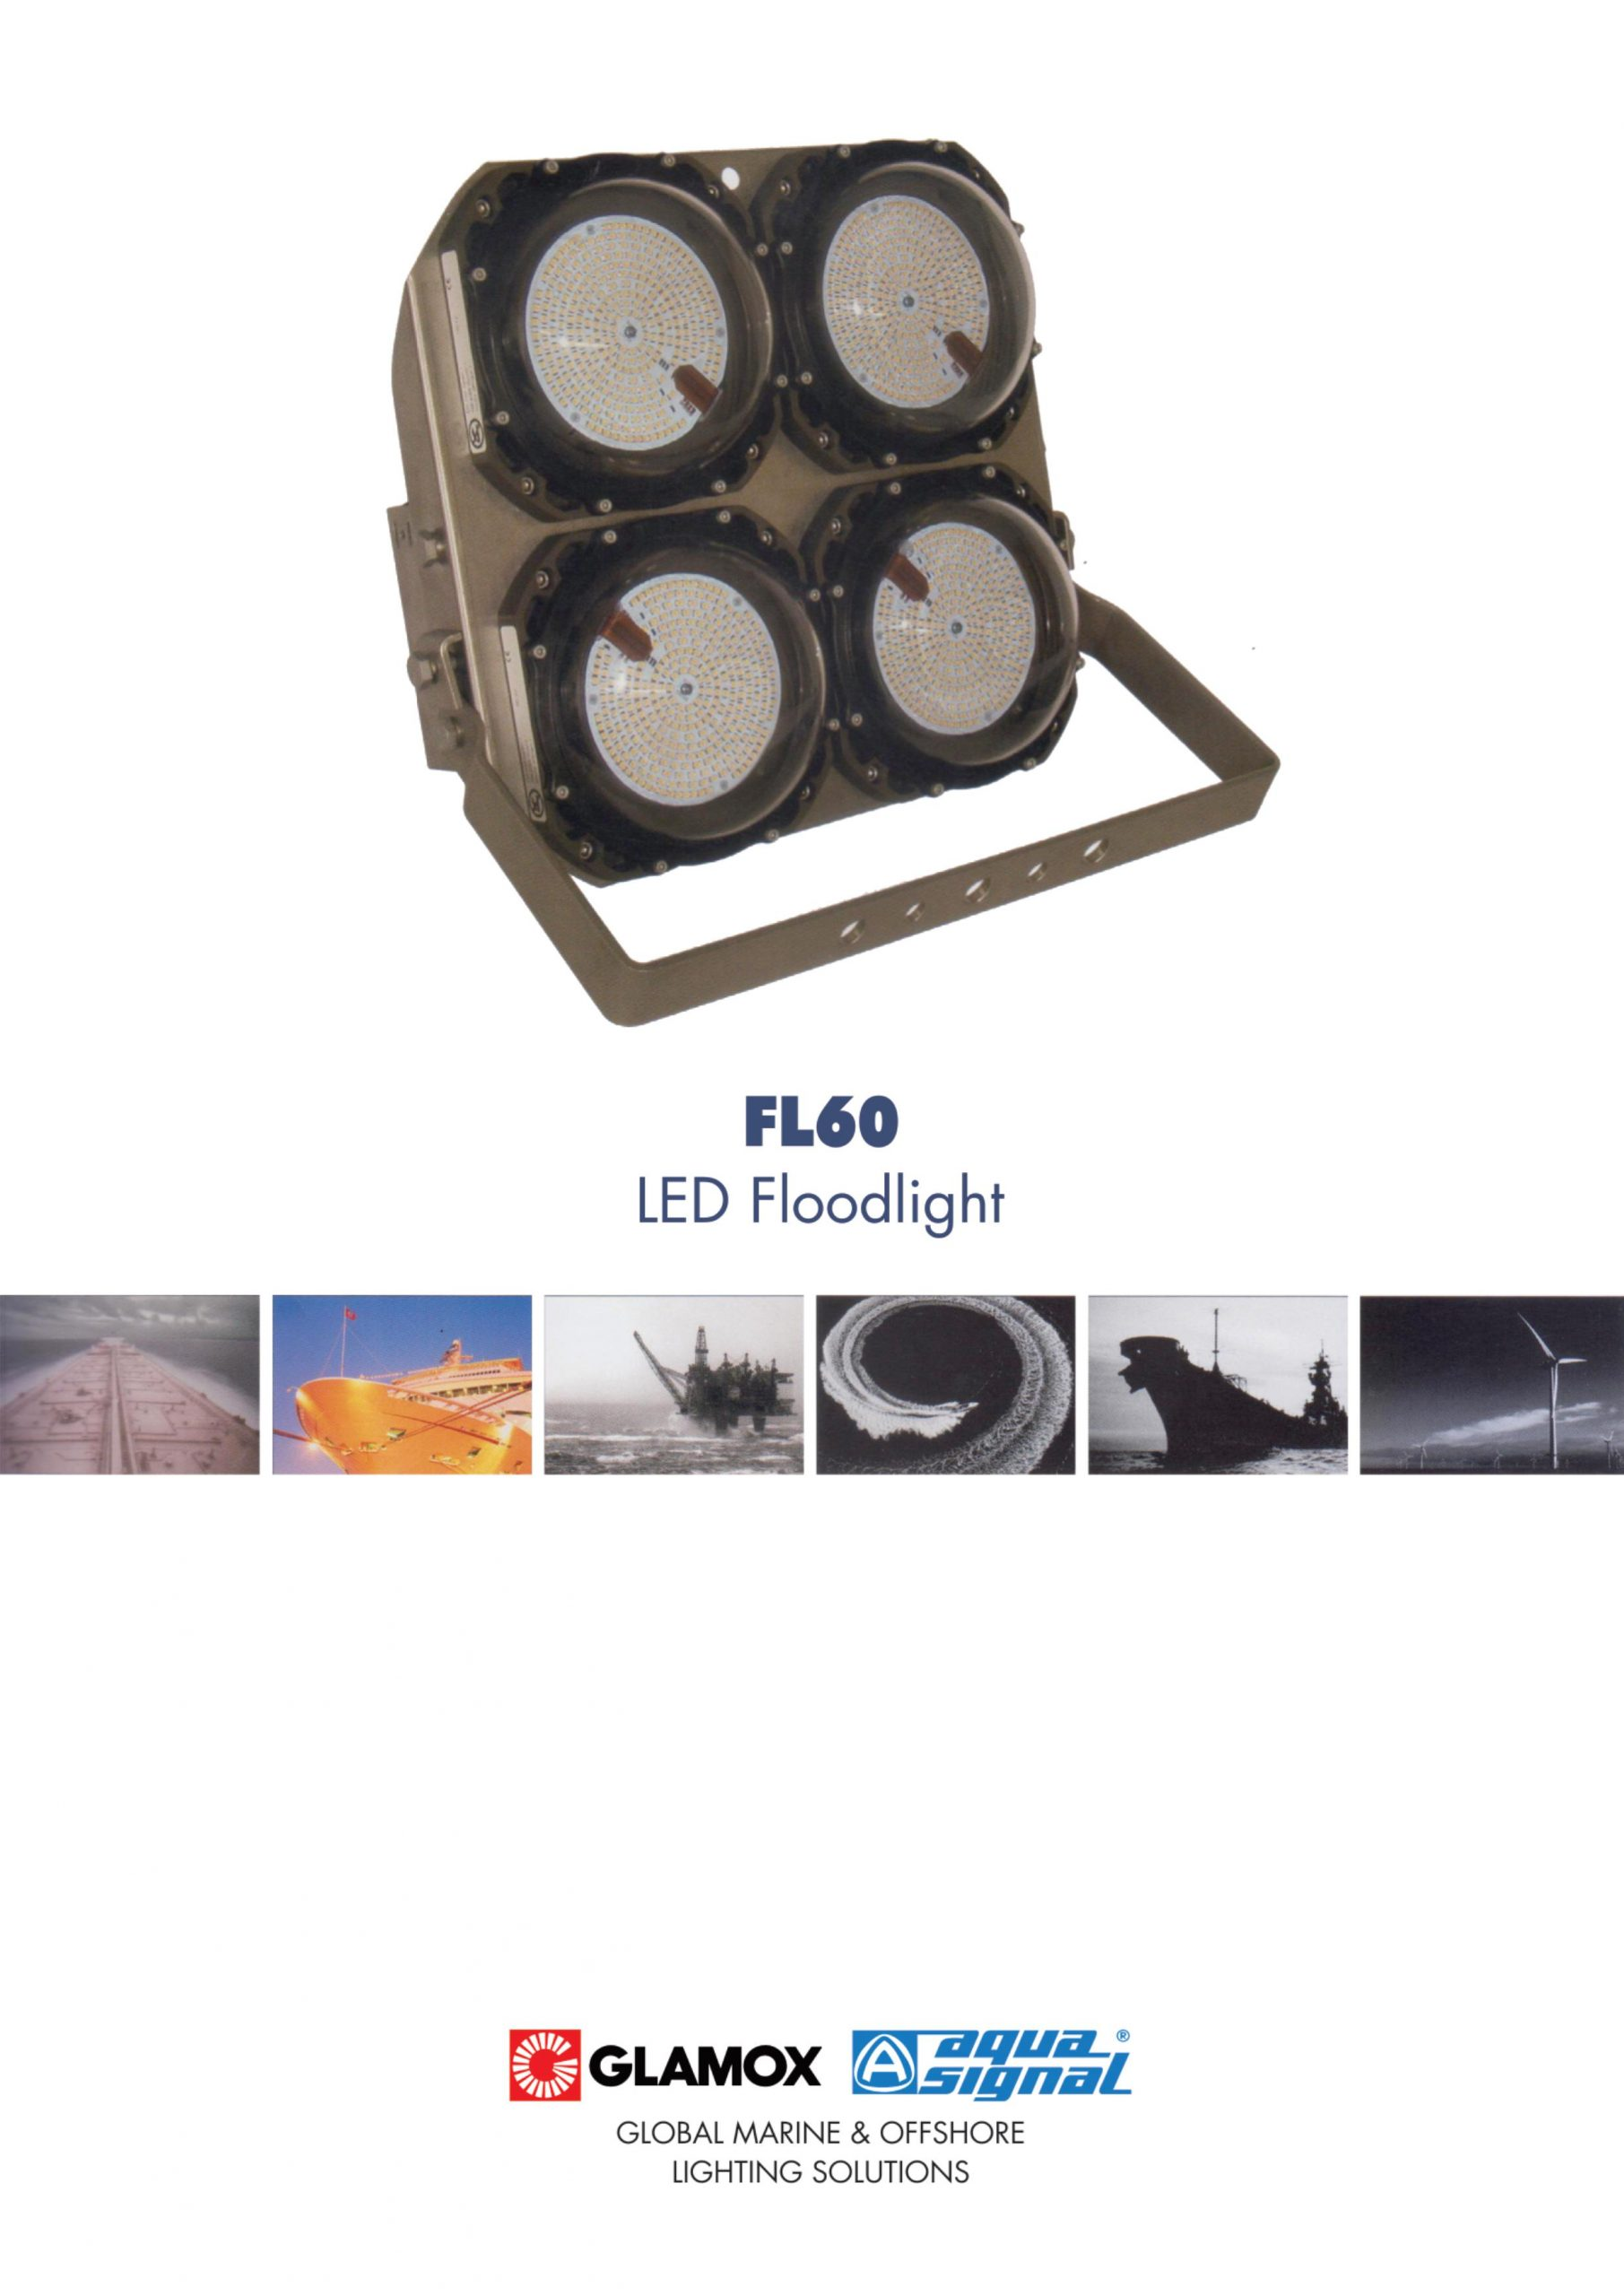 Glamox - Aqua signal - explosion proof light